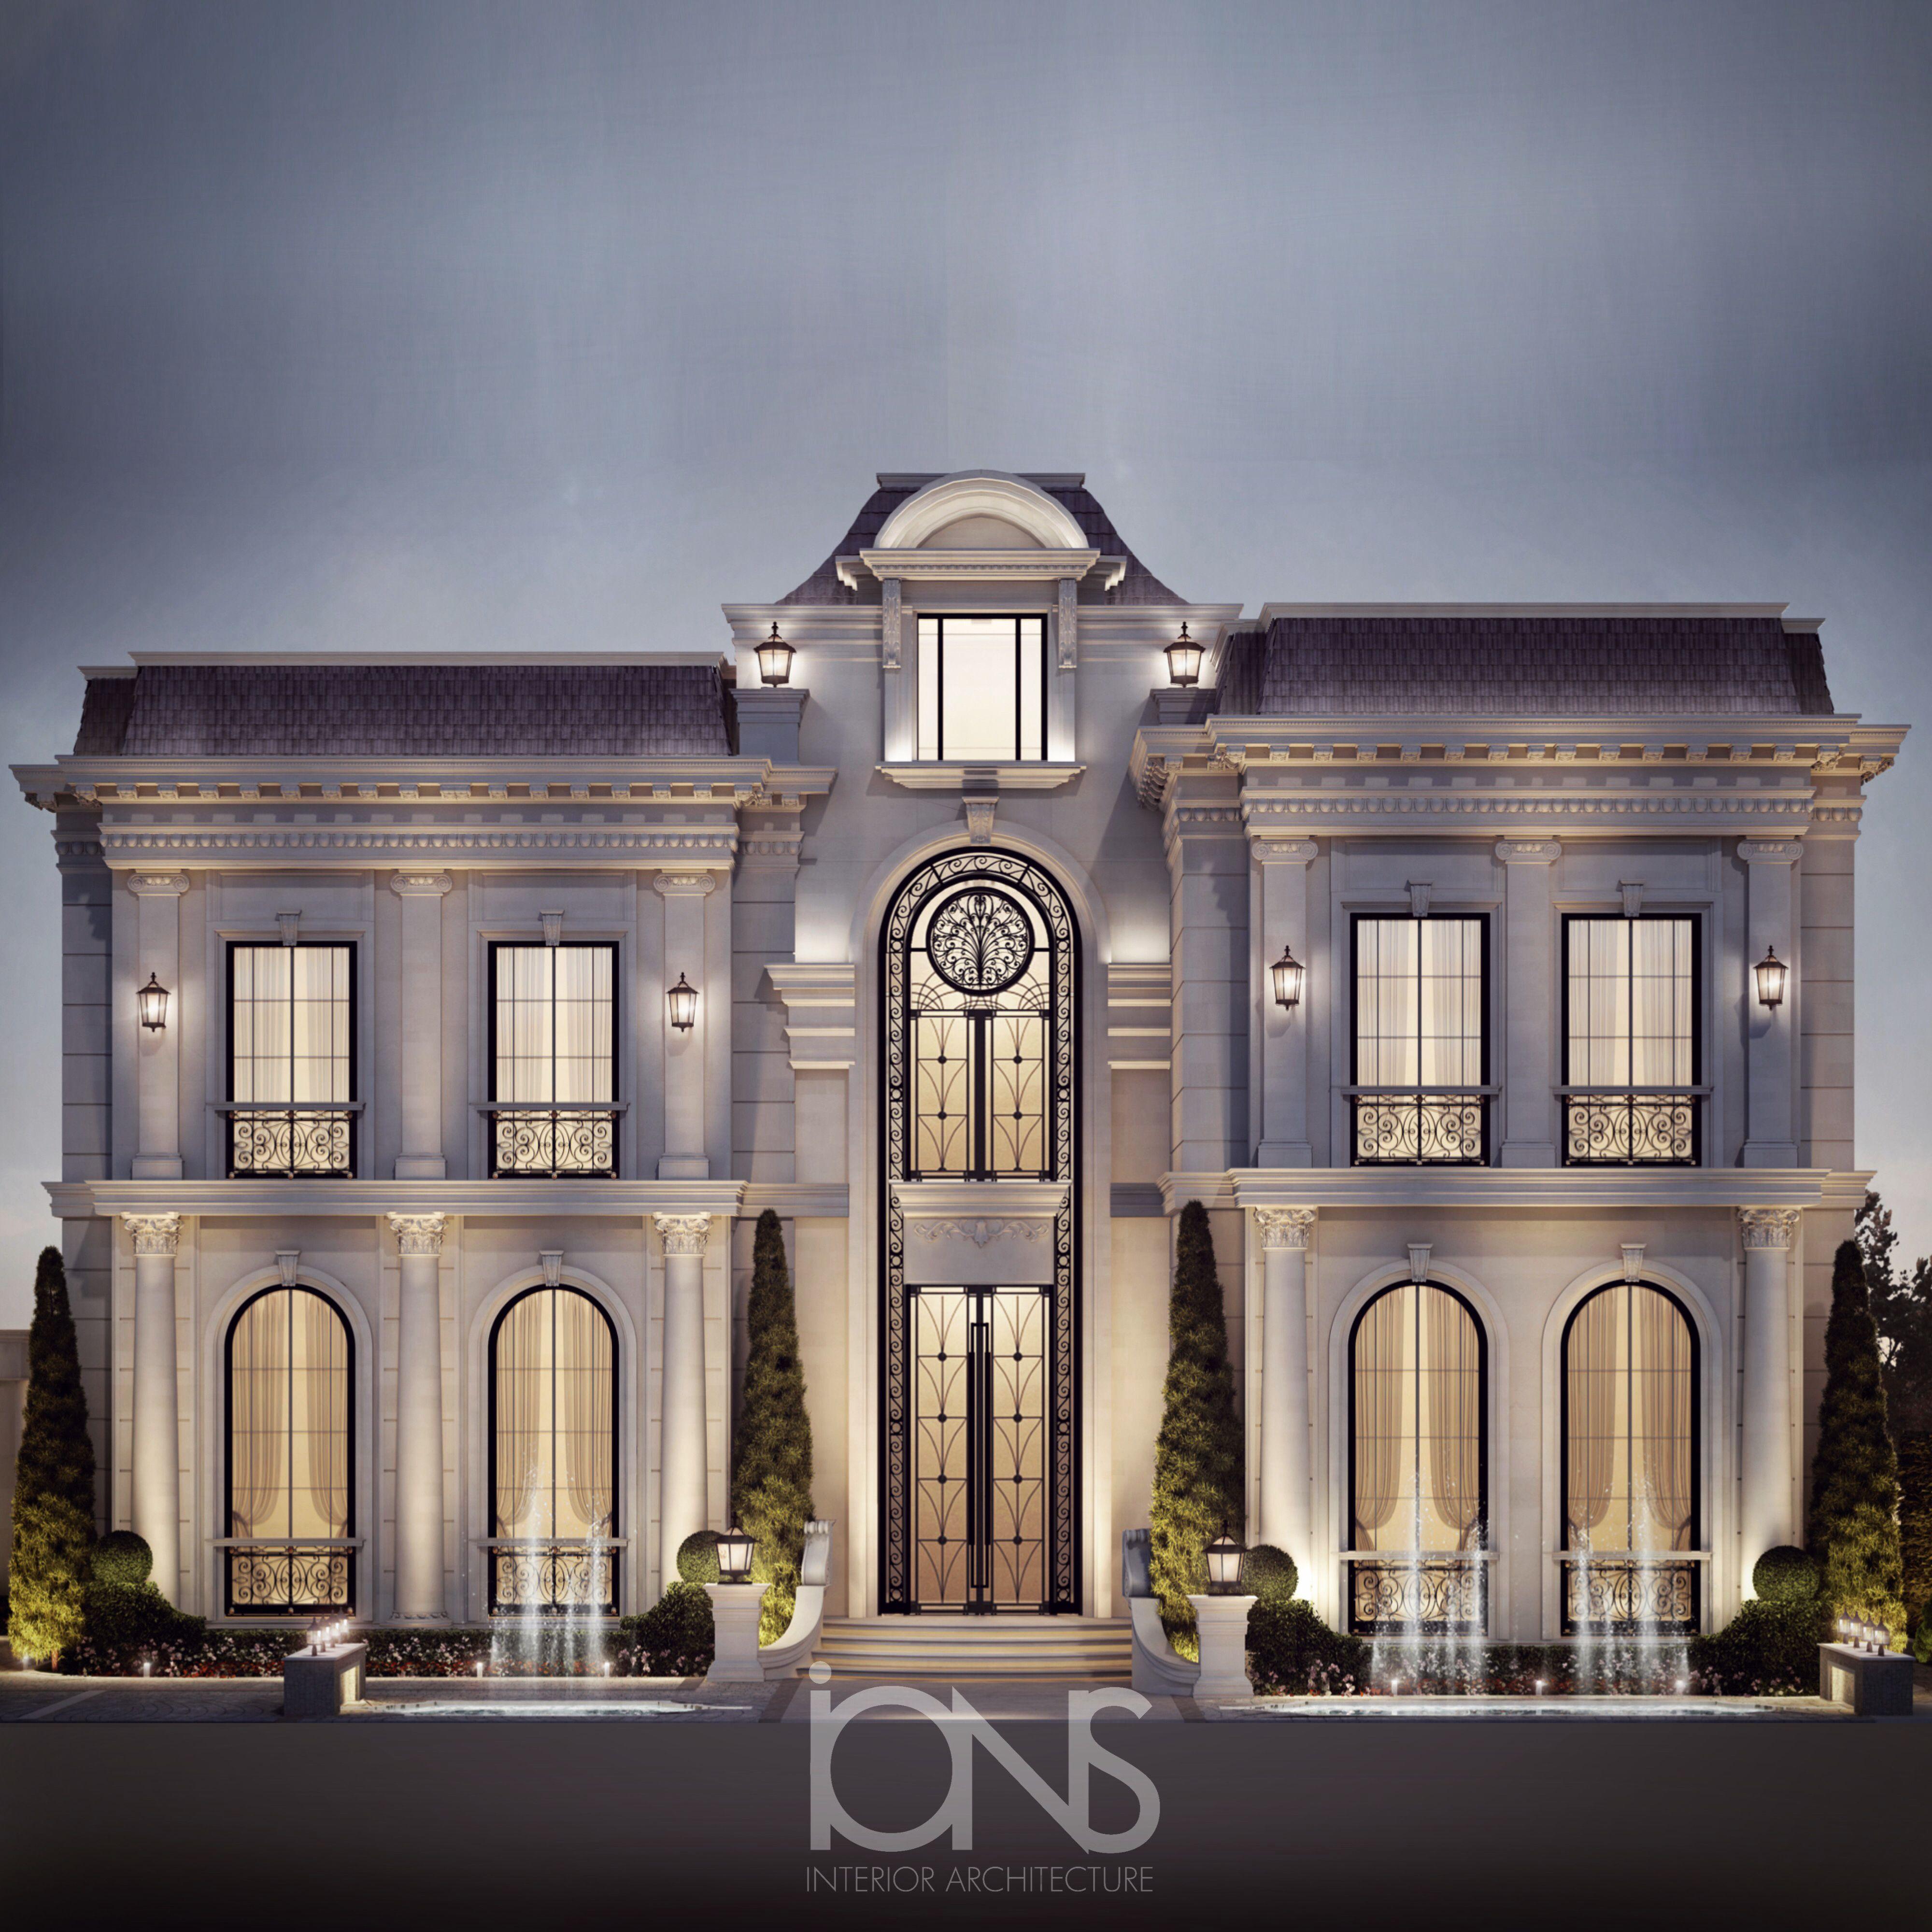 Ions Design Regency Architecture House Design Regency Architecture Classic House Design Classic House Exterior